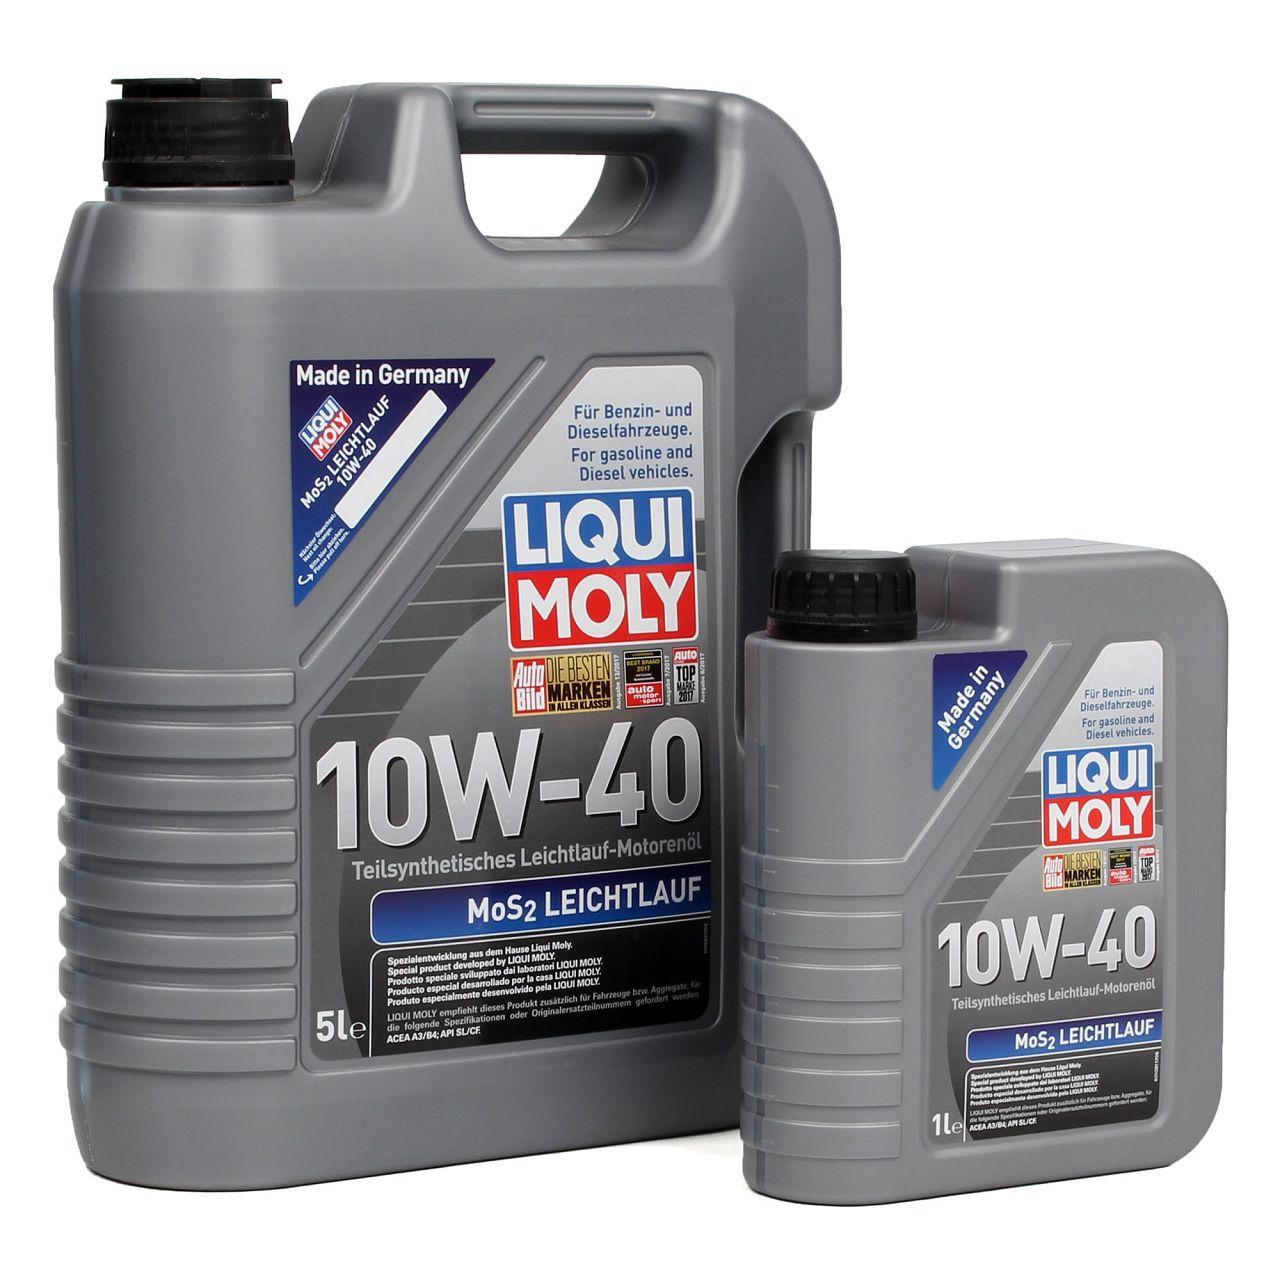 LIQUI MOLY Motoröl Öl MoS2 LEICHTLAUF 10W40 10W-40 6L 6Liter 1091 + 1092